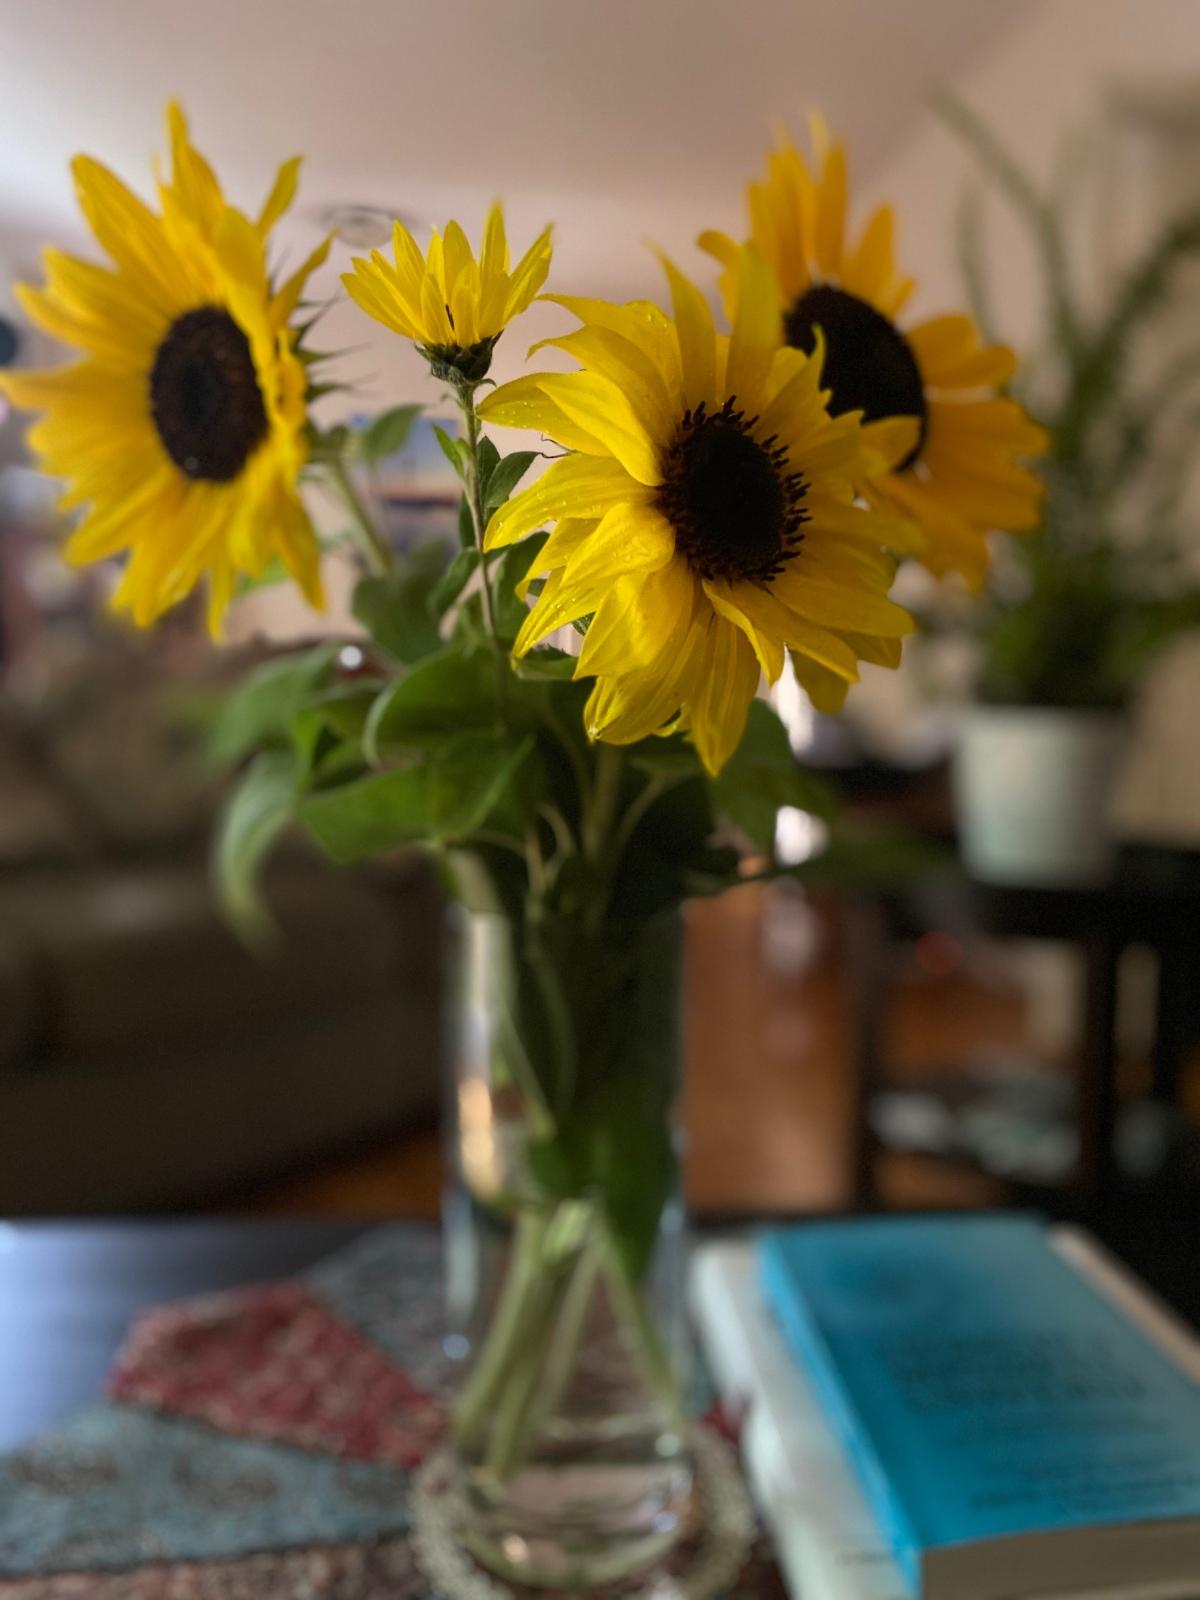 An Invitation For Newness AndRejuvenation